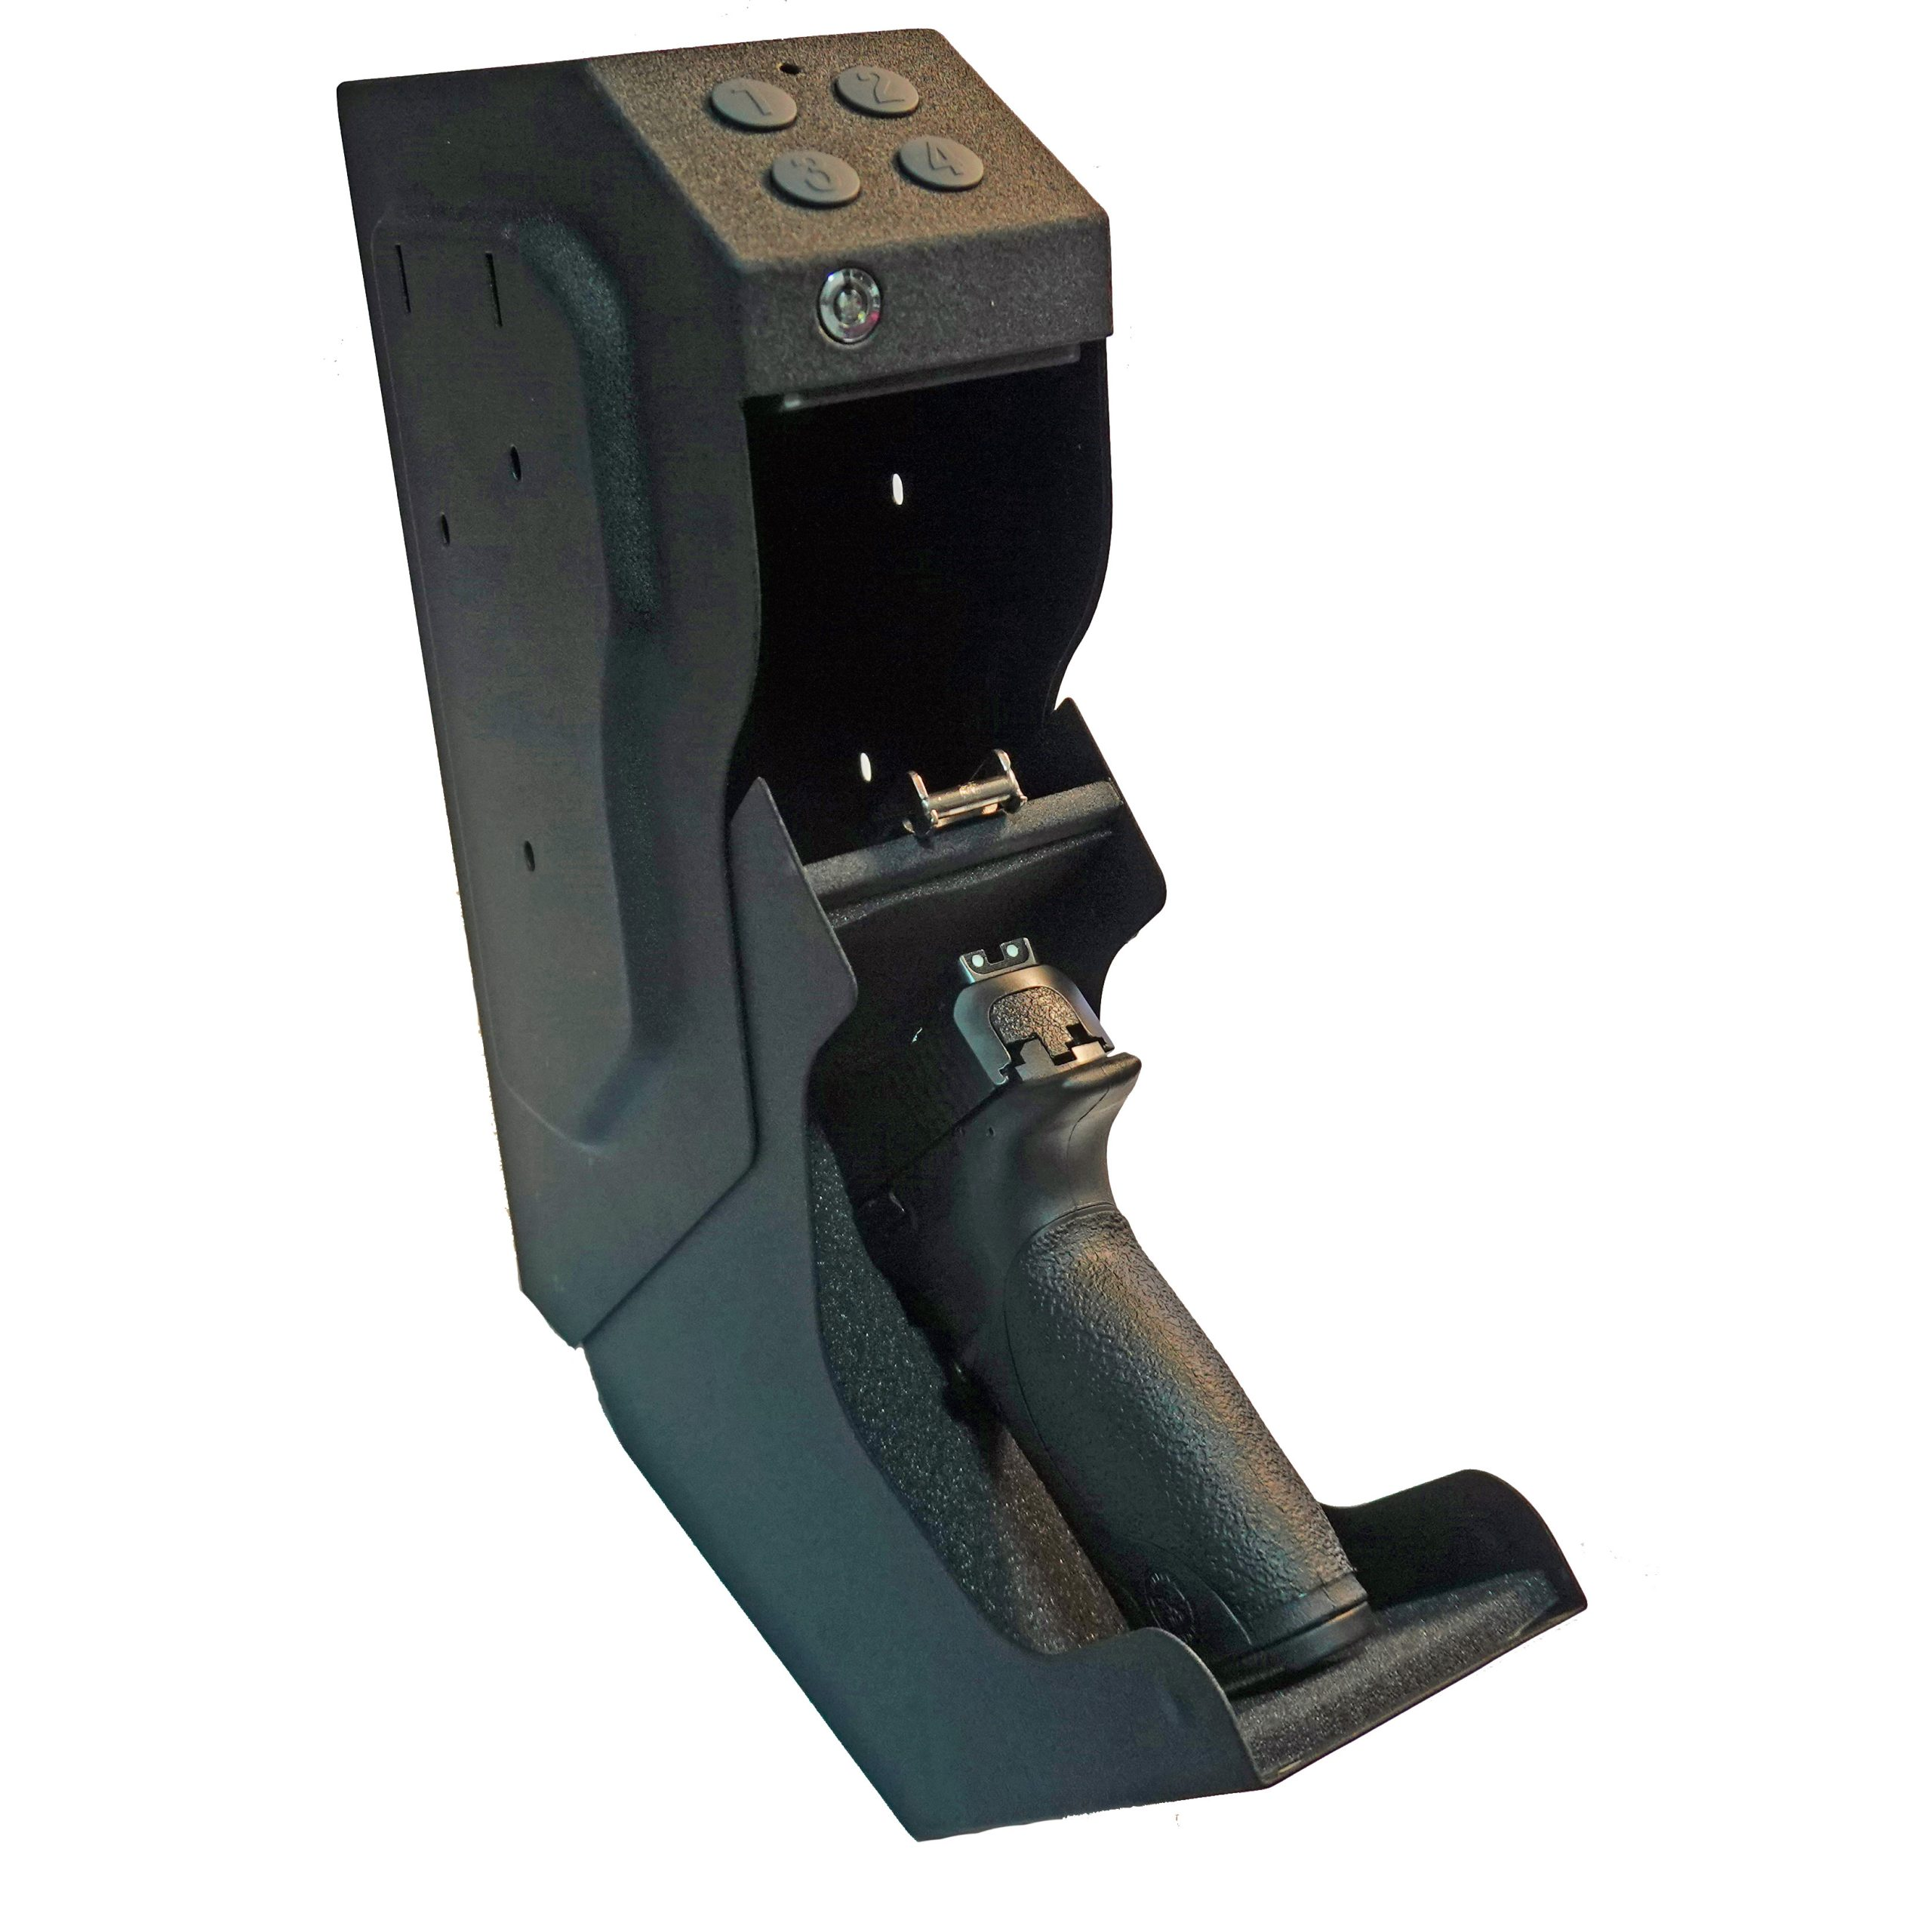 GunVault SpeedVault Hangun Safe